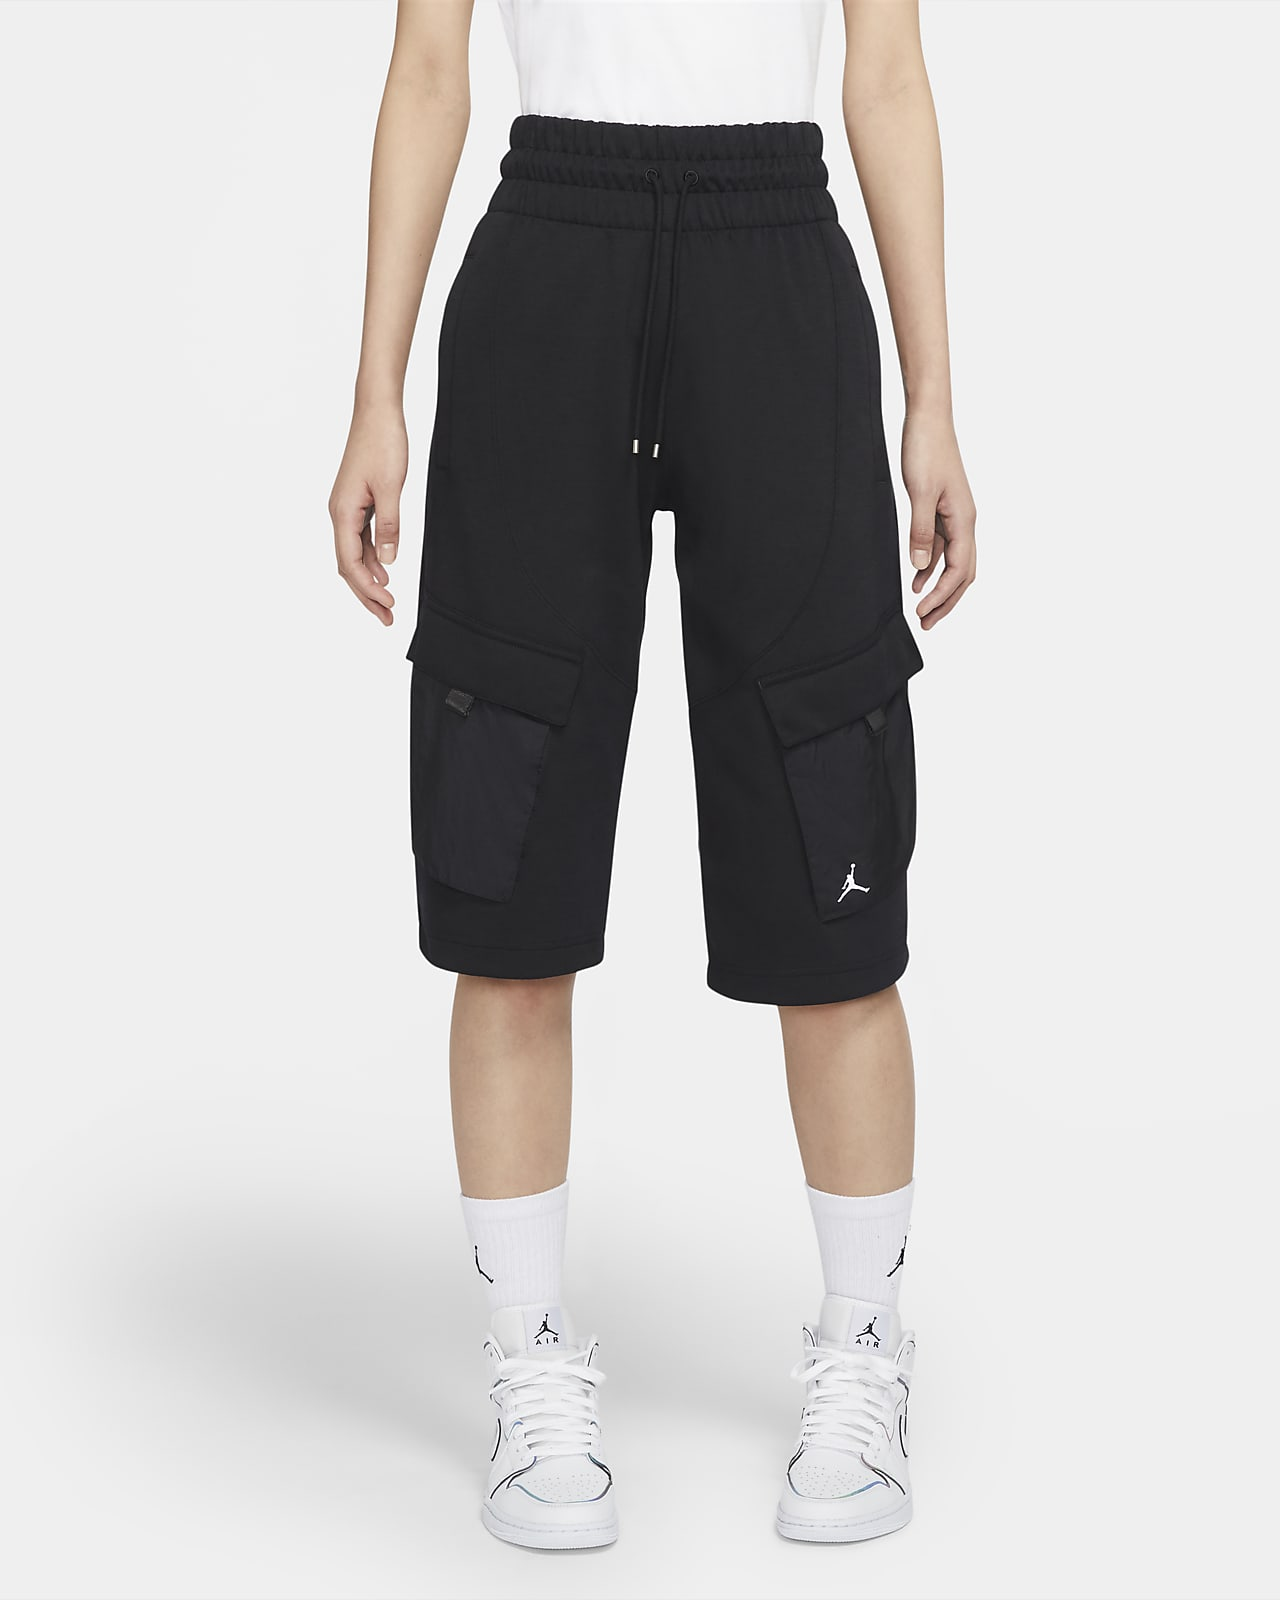 Jordan Women's Shorts